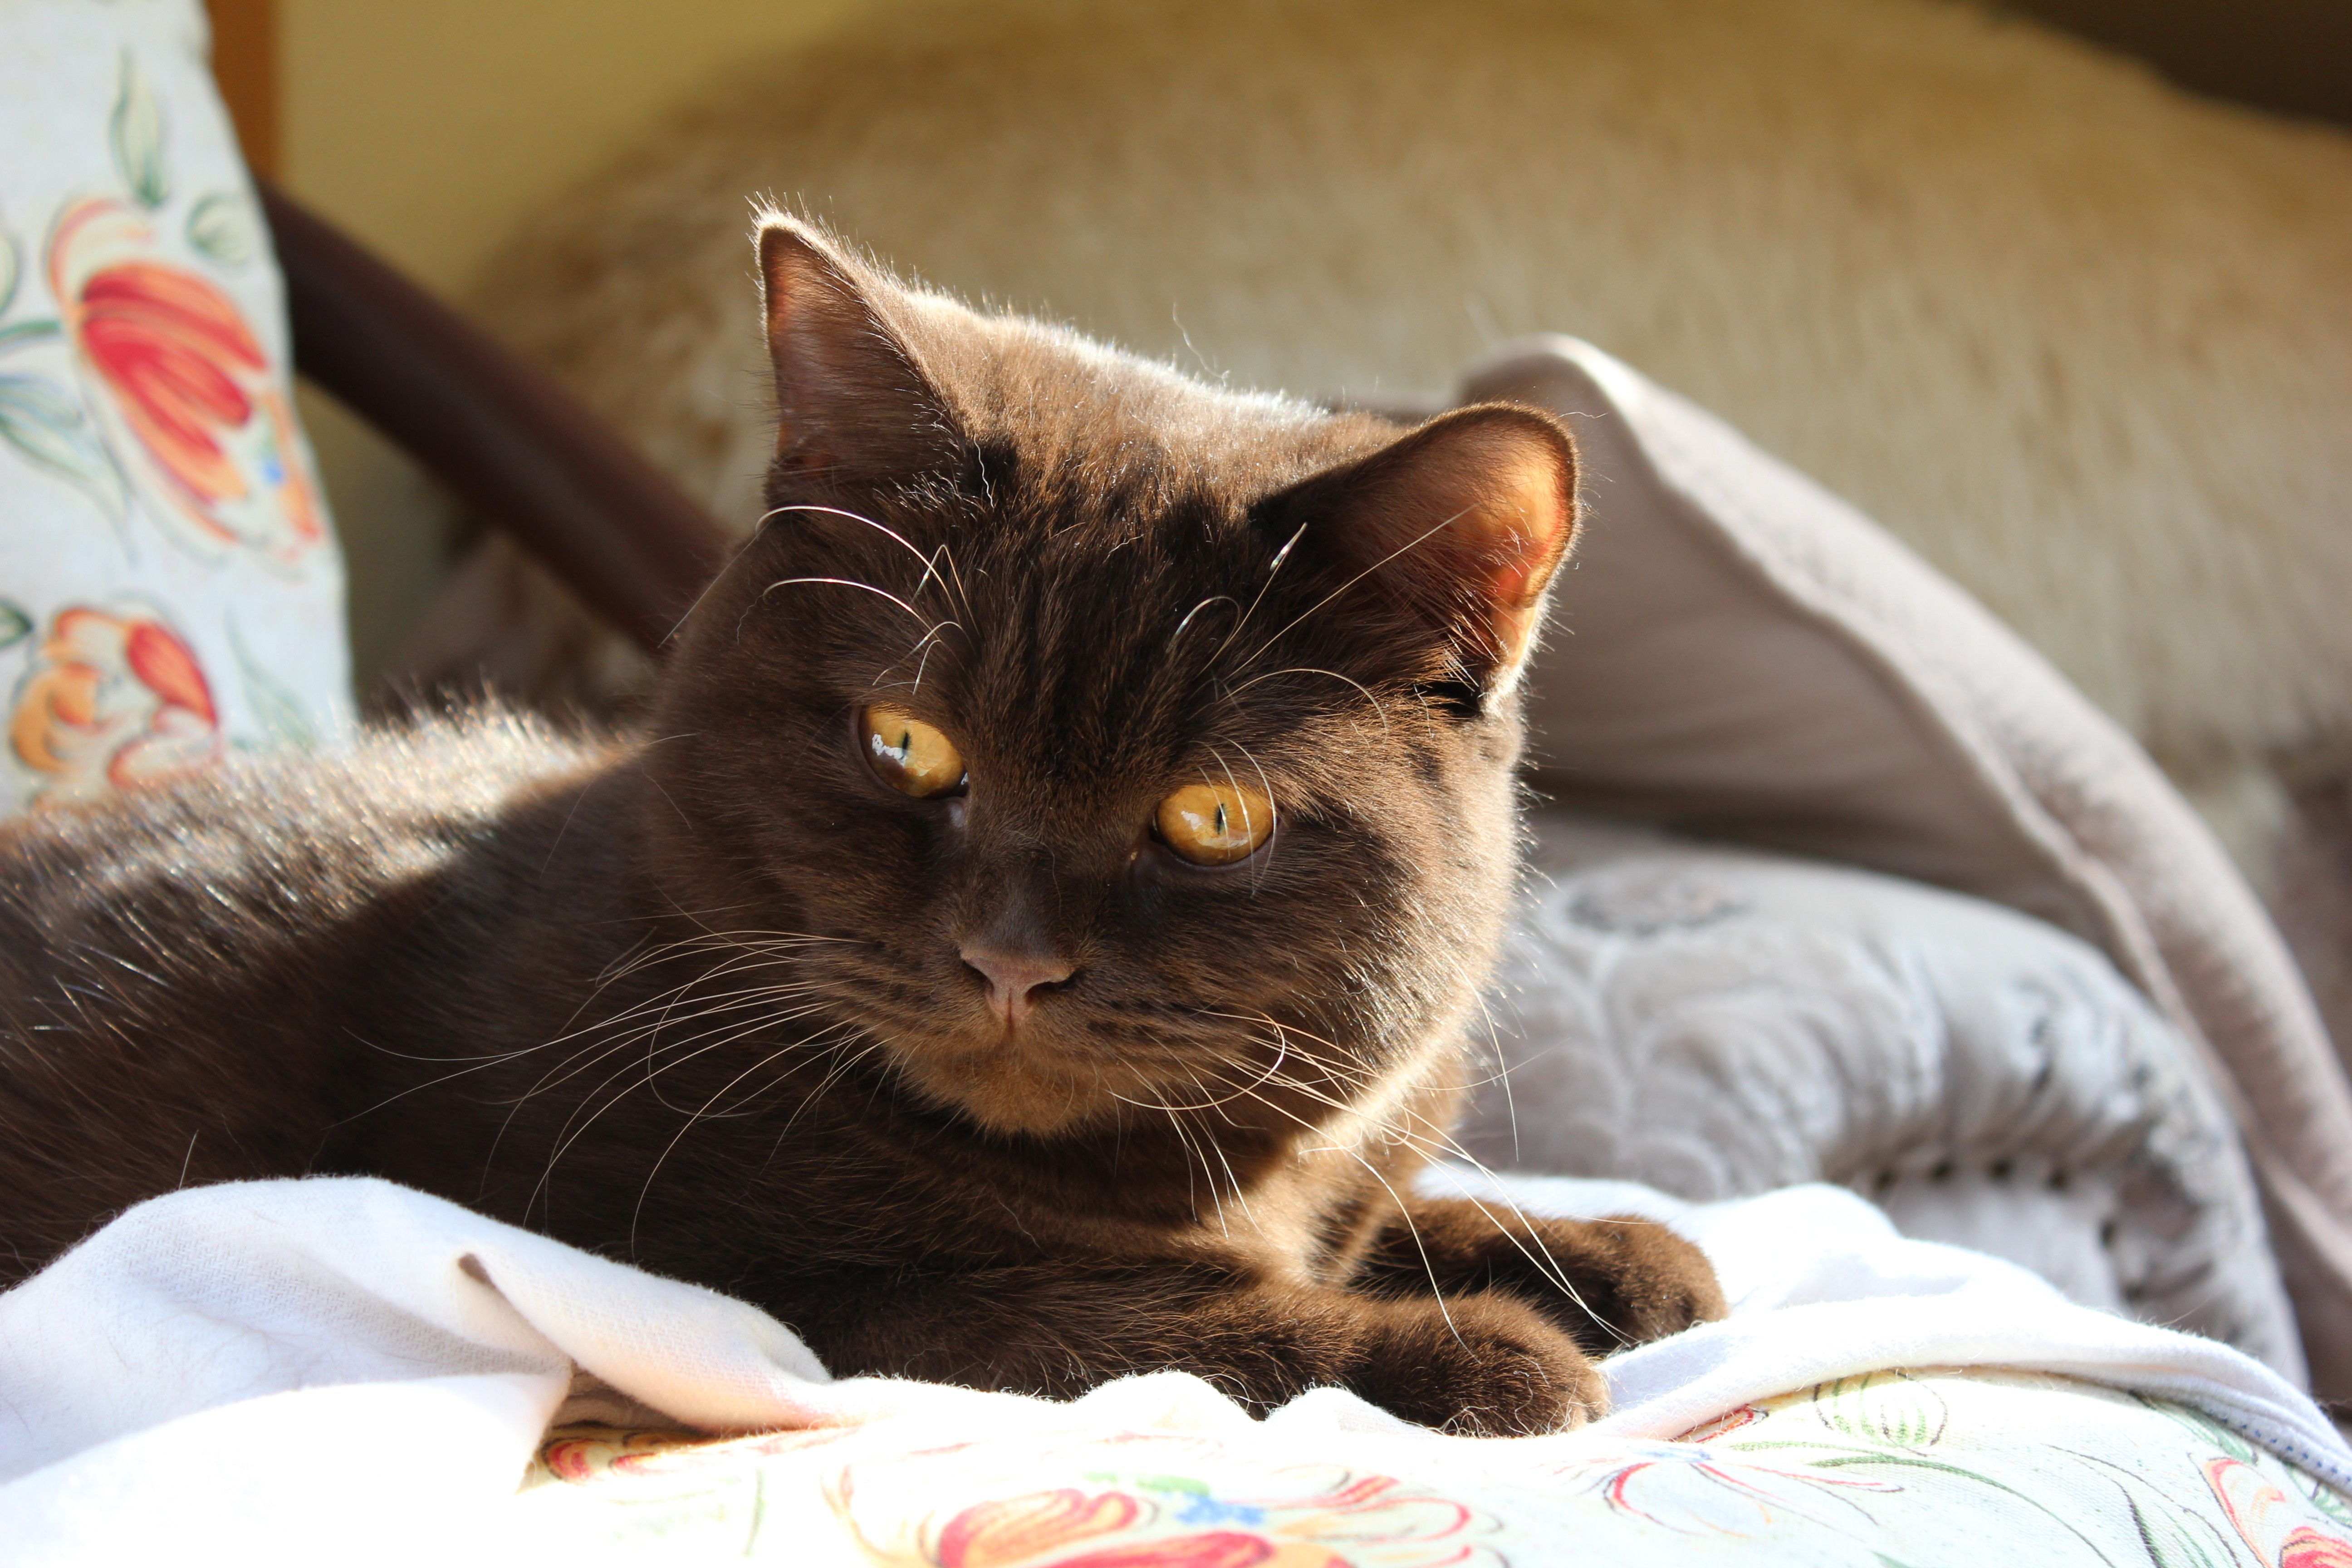 Geordie Quality cat, Cat photo, Cats